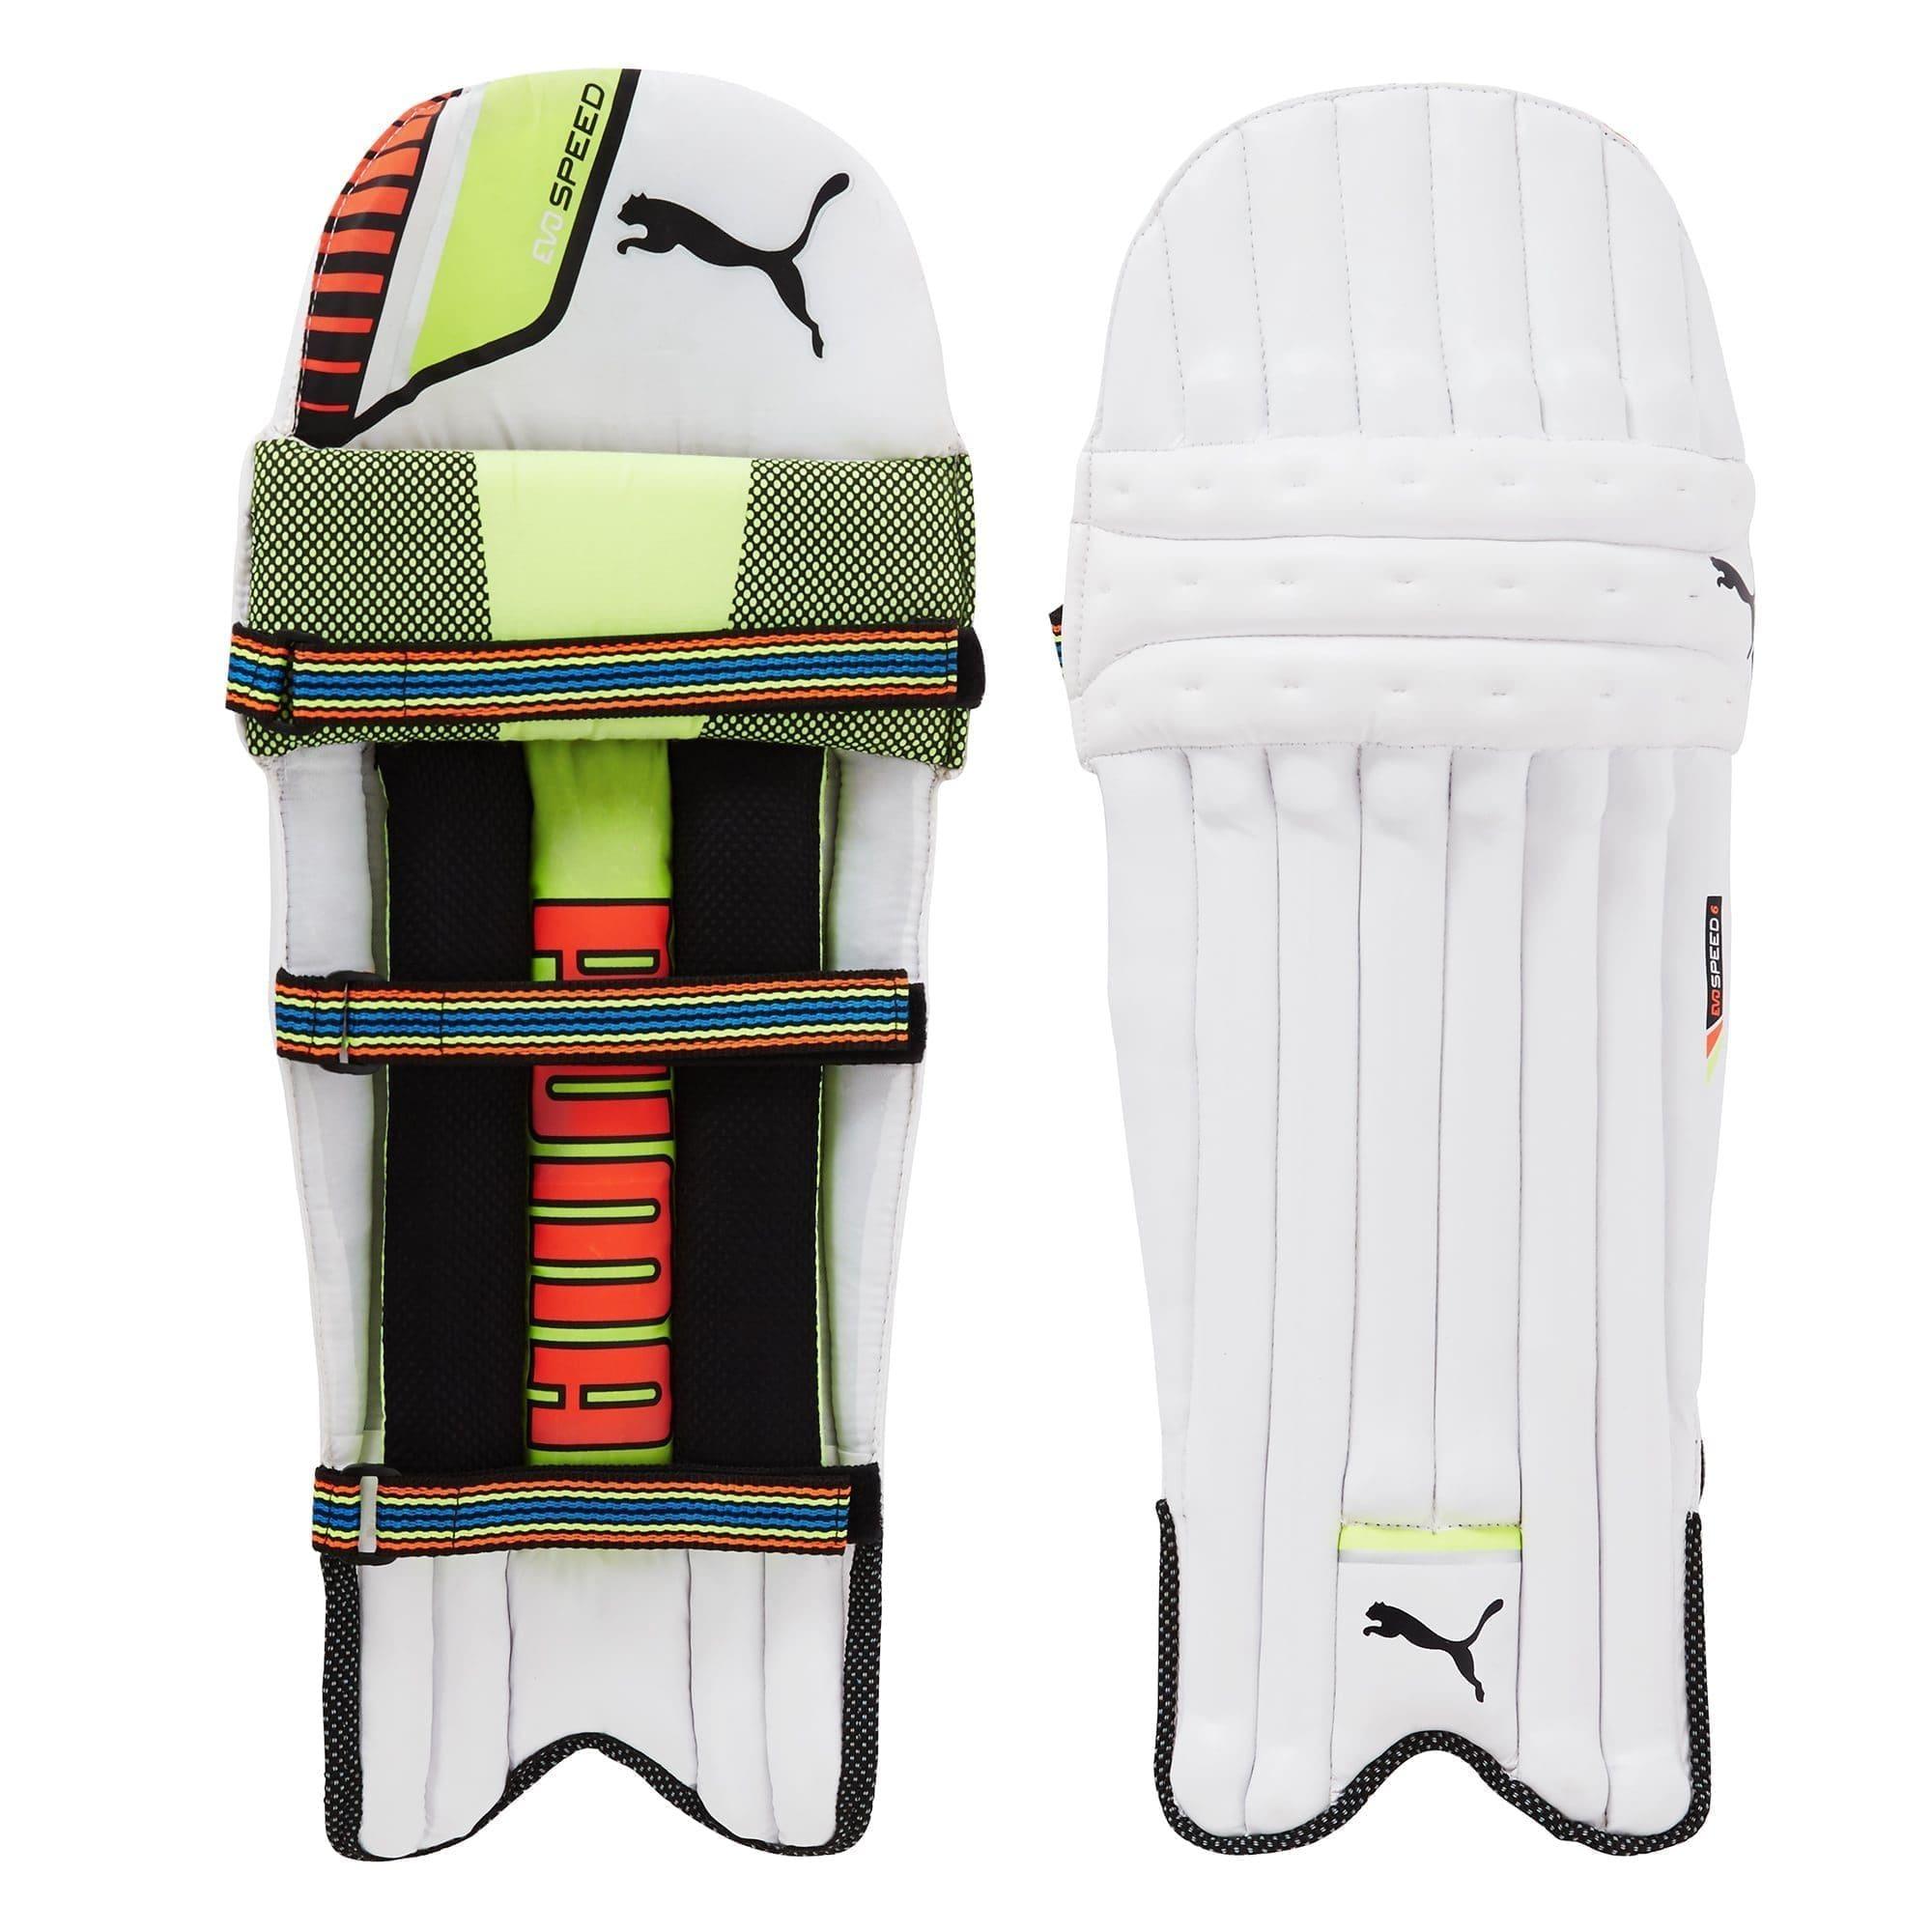 0363ec73d105 Puma Pads evoSPEED 6 - All Cricket Gear